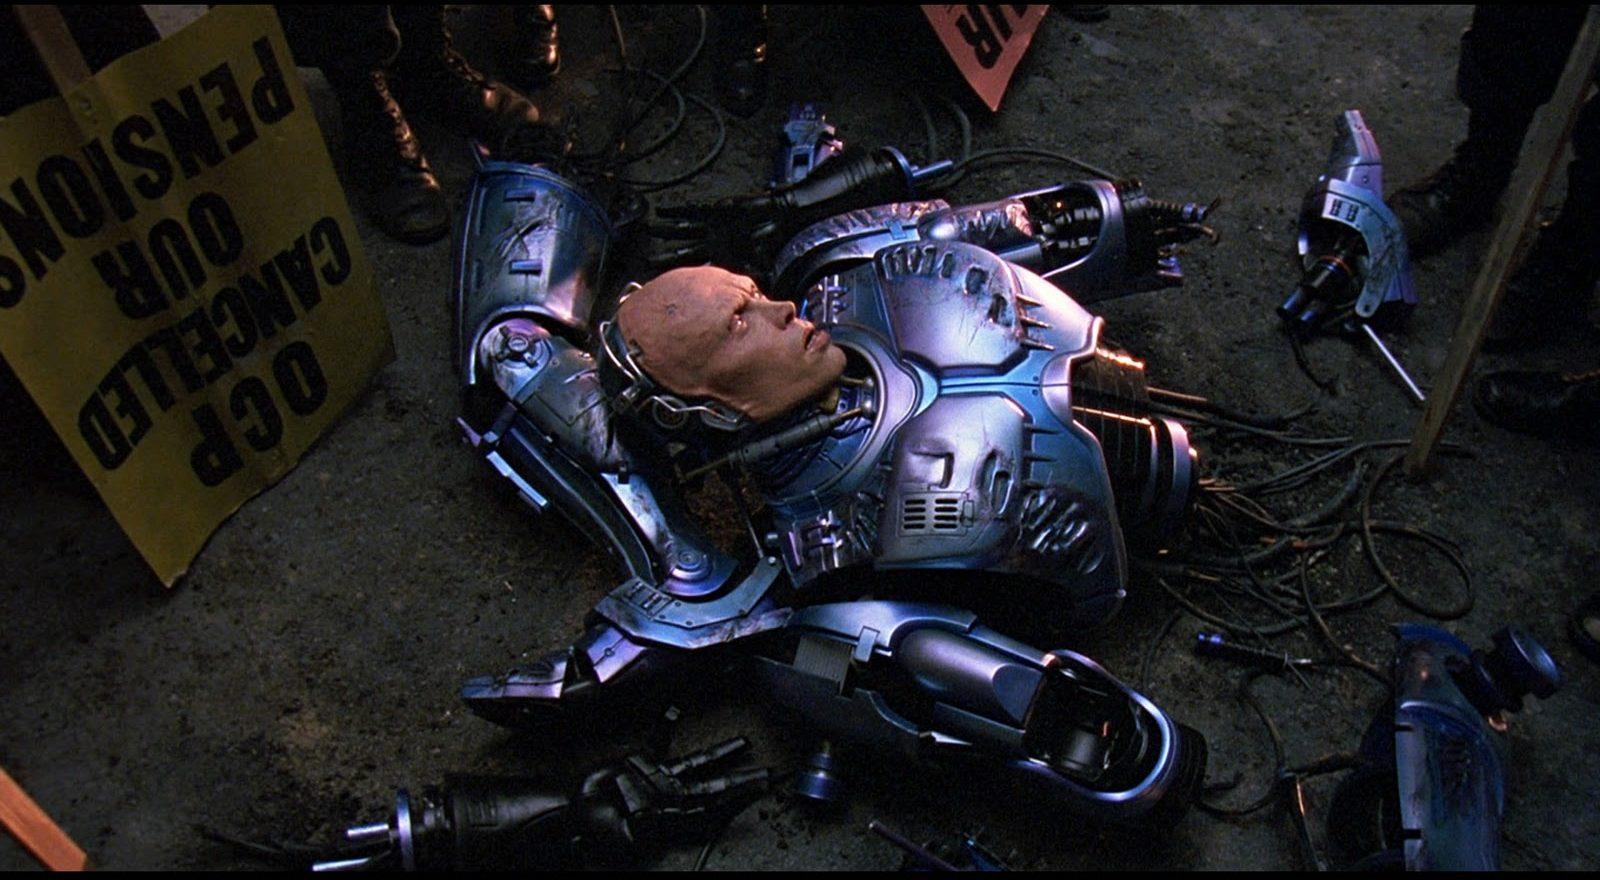 17b e1609346317976 20 Futuristic Facts About RoboCop 2